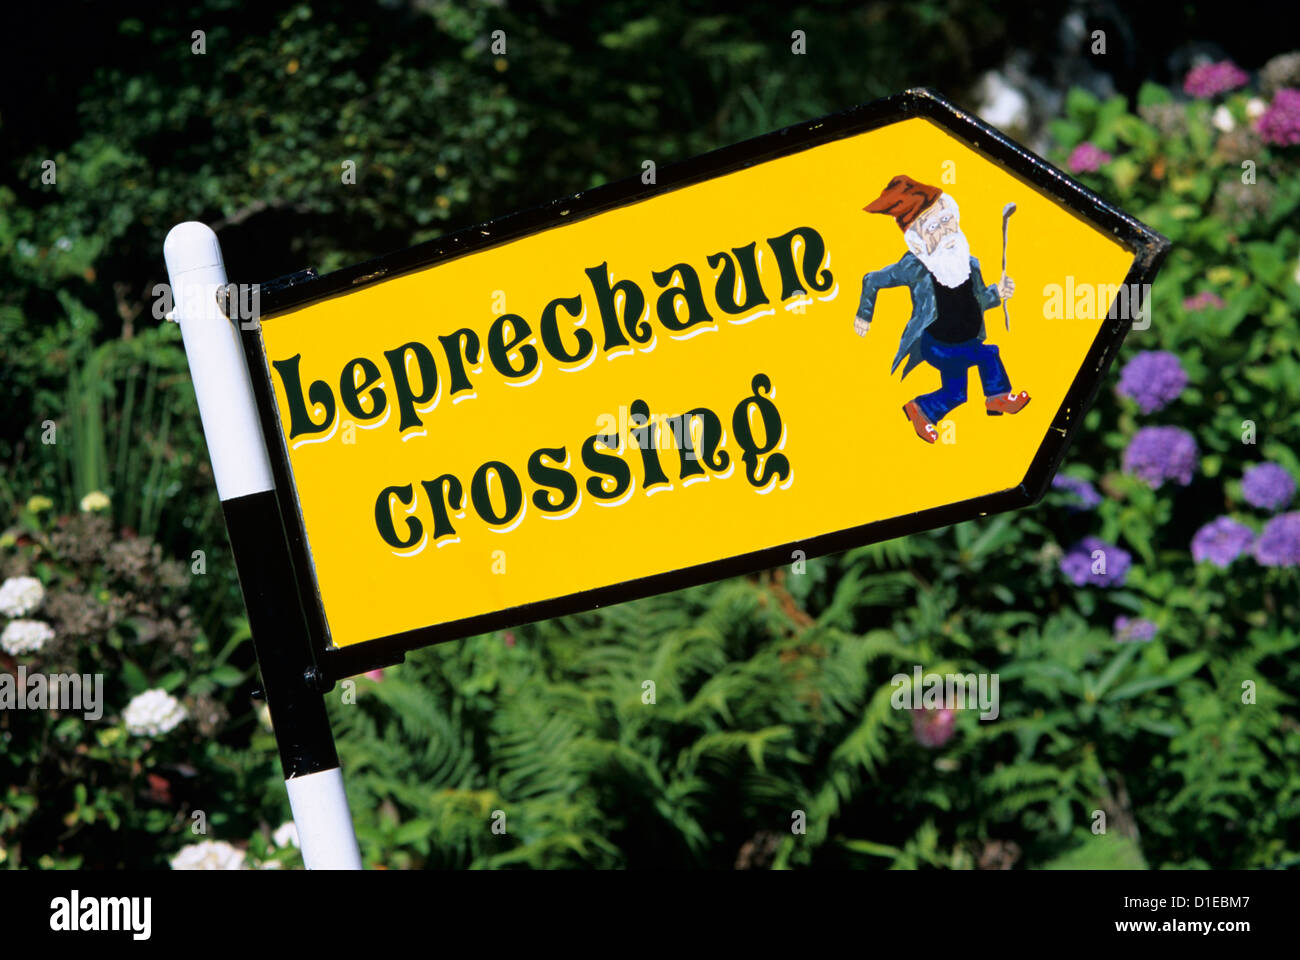 Leprechaun crossing signpost, County Kerry, Munster, Republic of Ireland, Europe - Stock Image